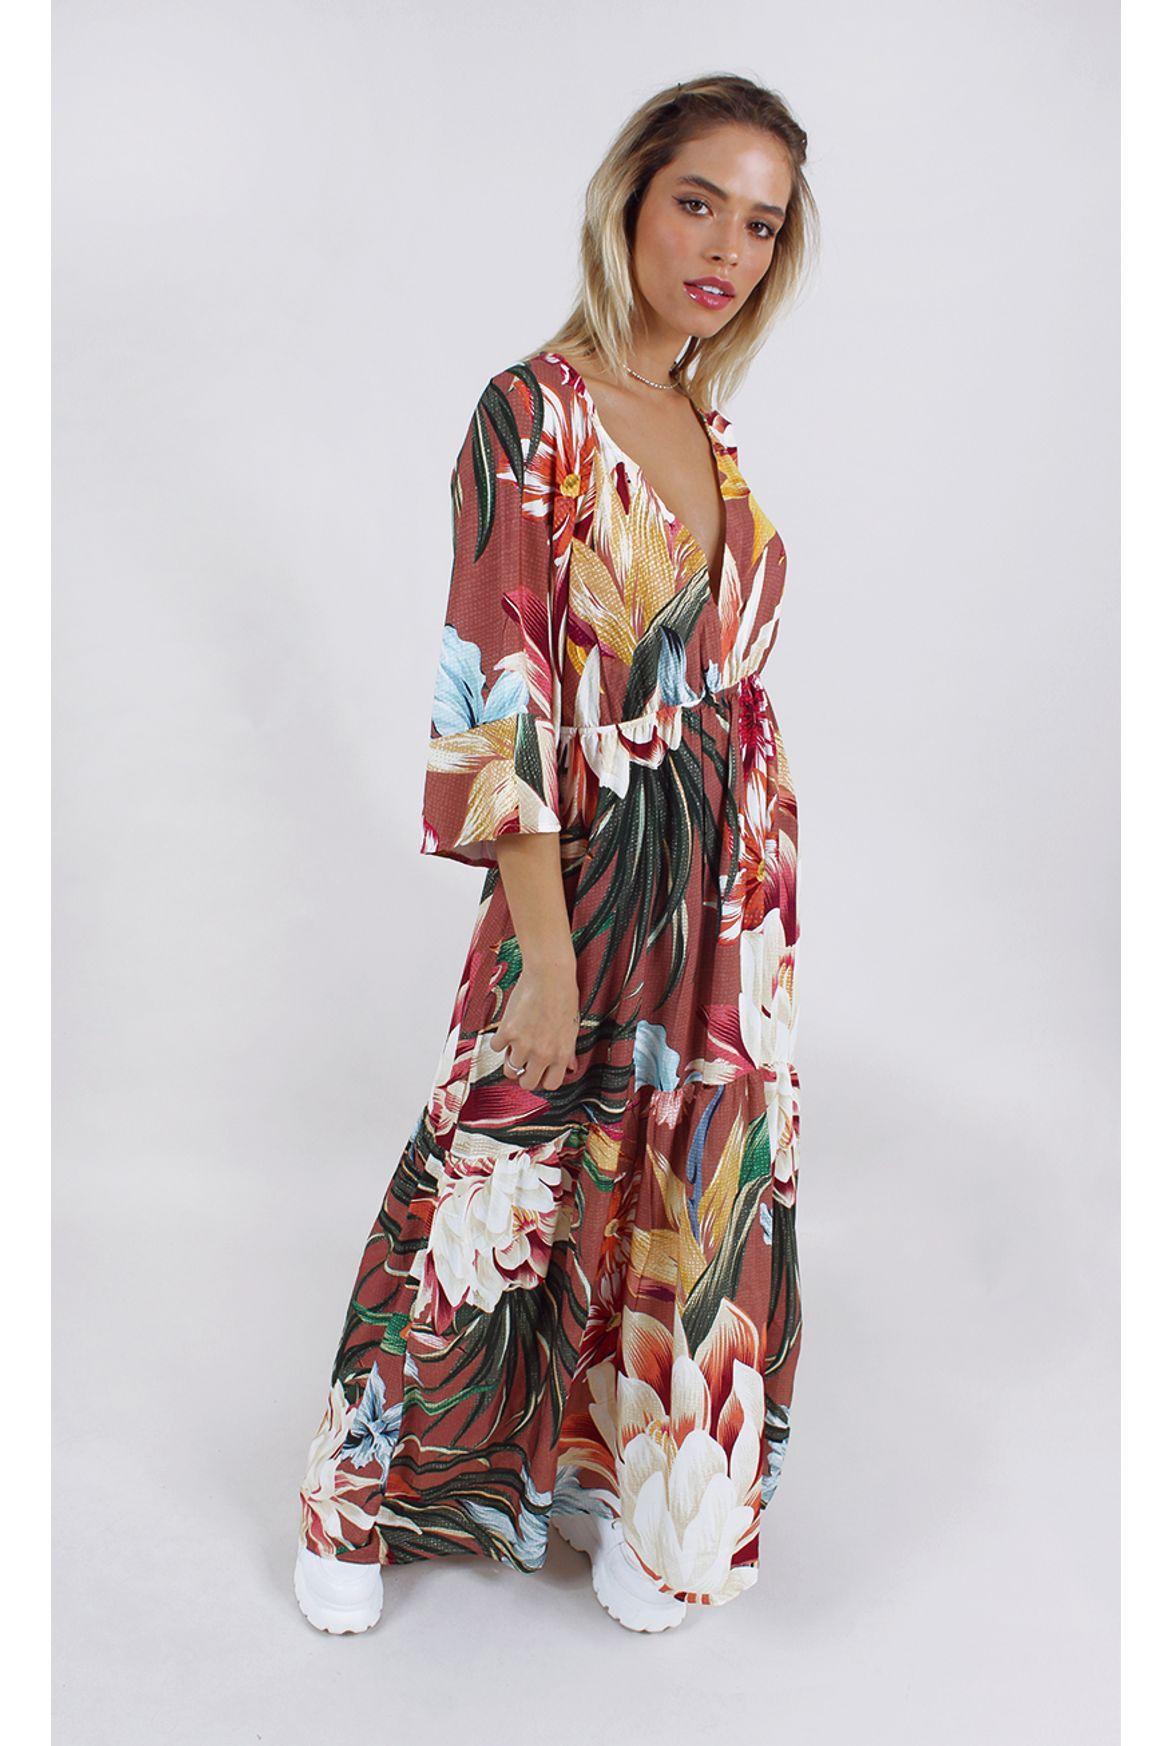 Fshn Vestido Farm Longo Floral Iza Estampa Fashion Closet